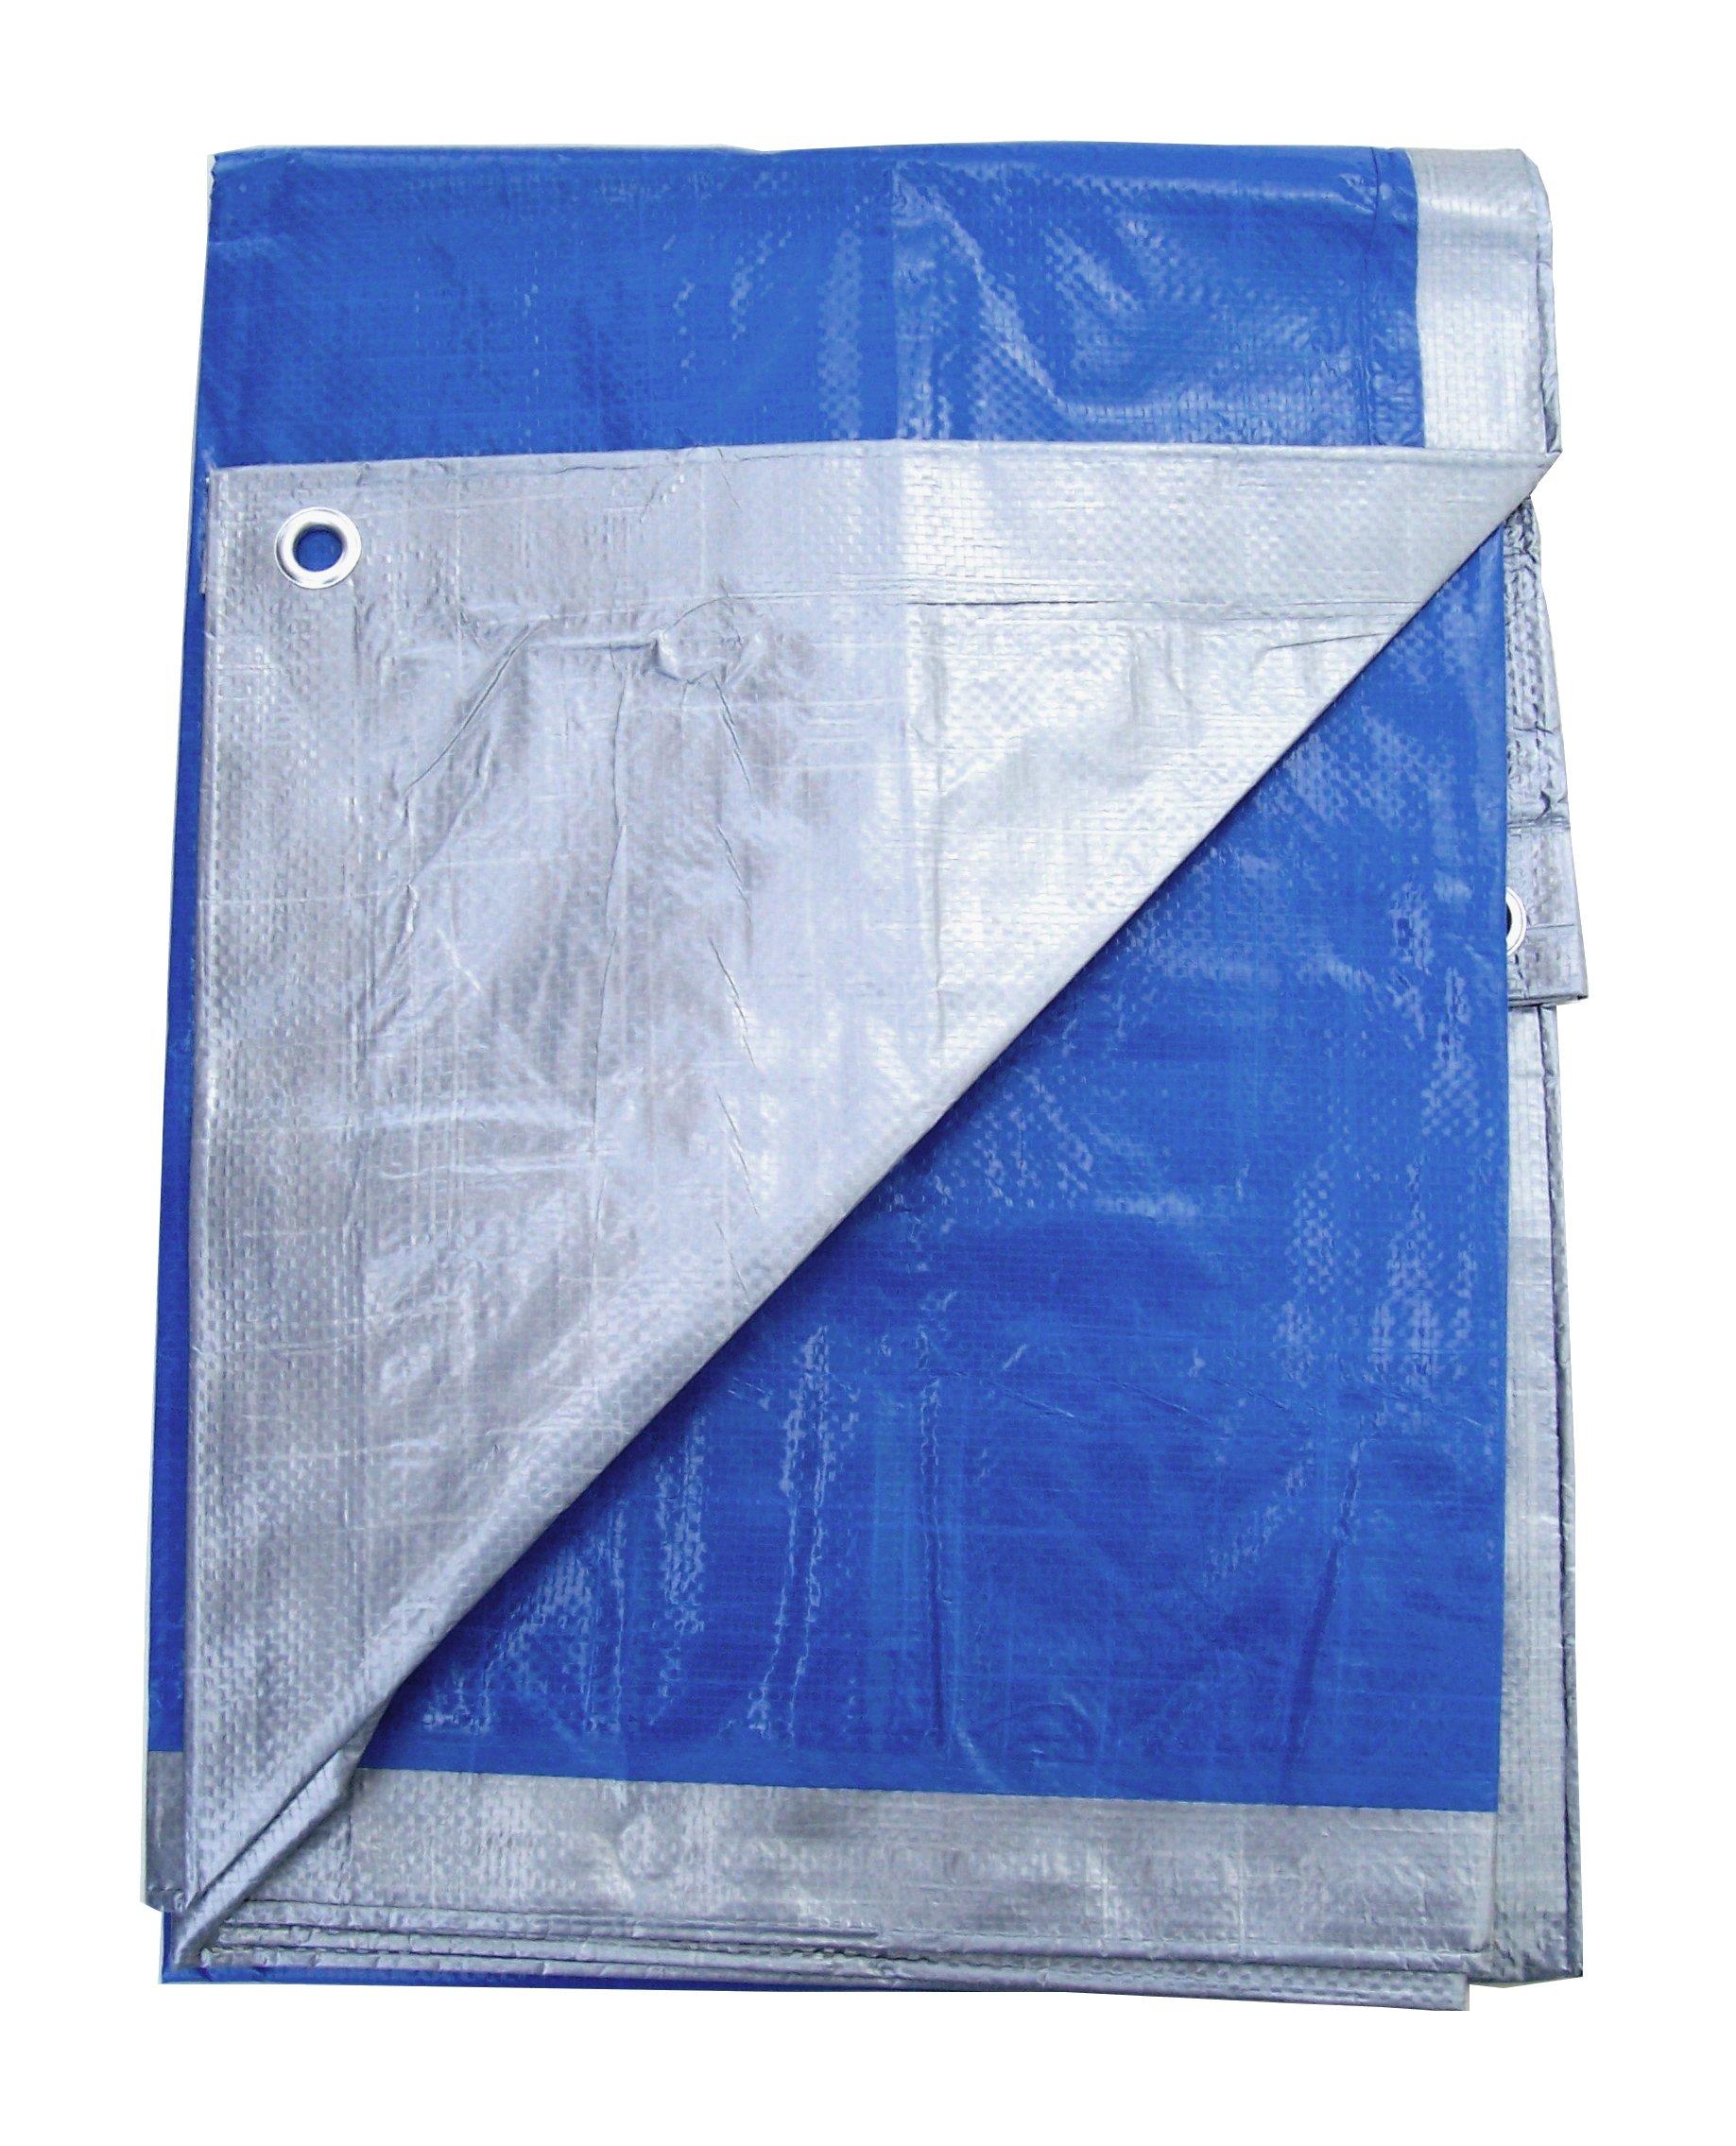 12' x 28' Silver & Blue Reversible Premium Tarp by Fabrimetrics Inc